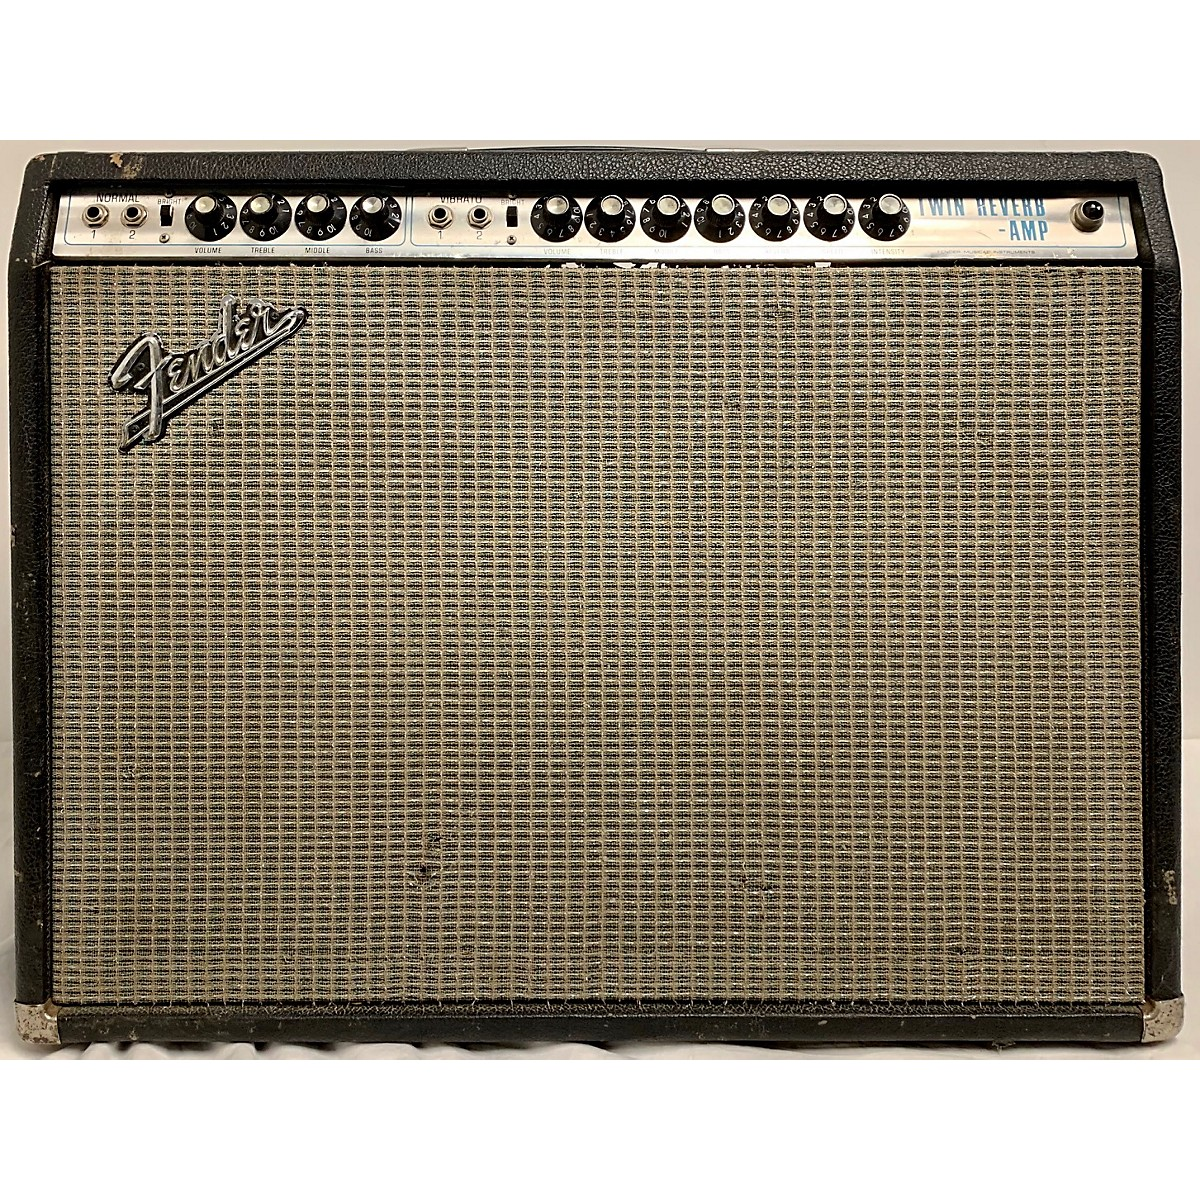 Fender 1969 Twin Reverb 2x12 Tube Guitar Combo Amp